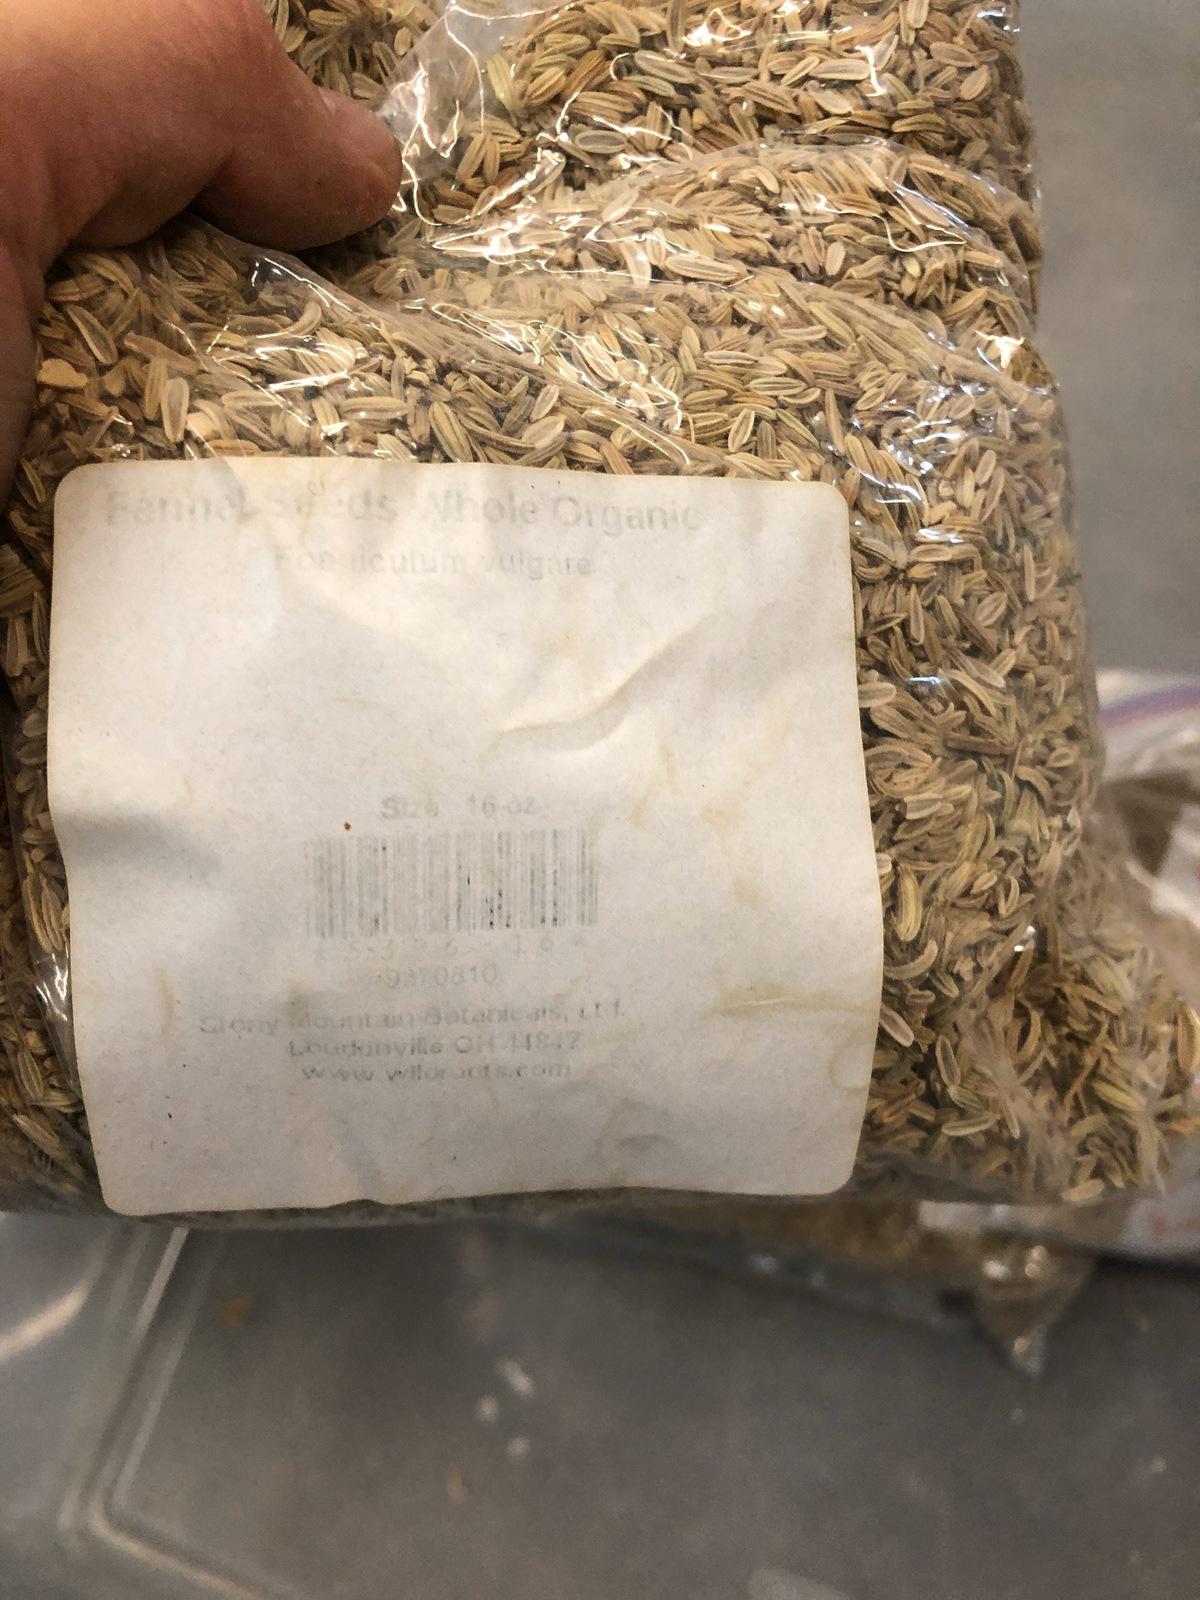 Lot of Herbs and Botanicals: Orange Peel, Peppermint Leaf, Cinchona Bark, Caraw | Rig Fee: $20 or HC - Image 17 of 17